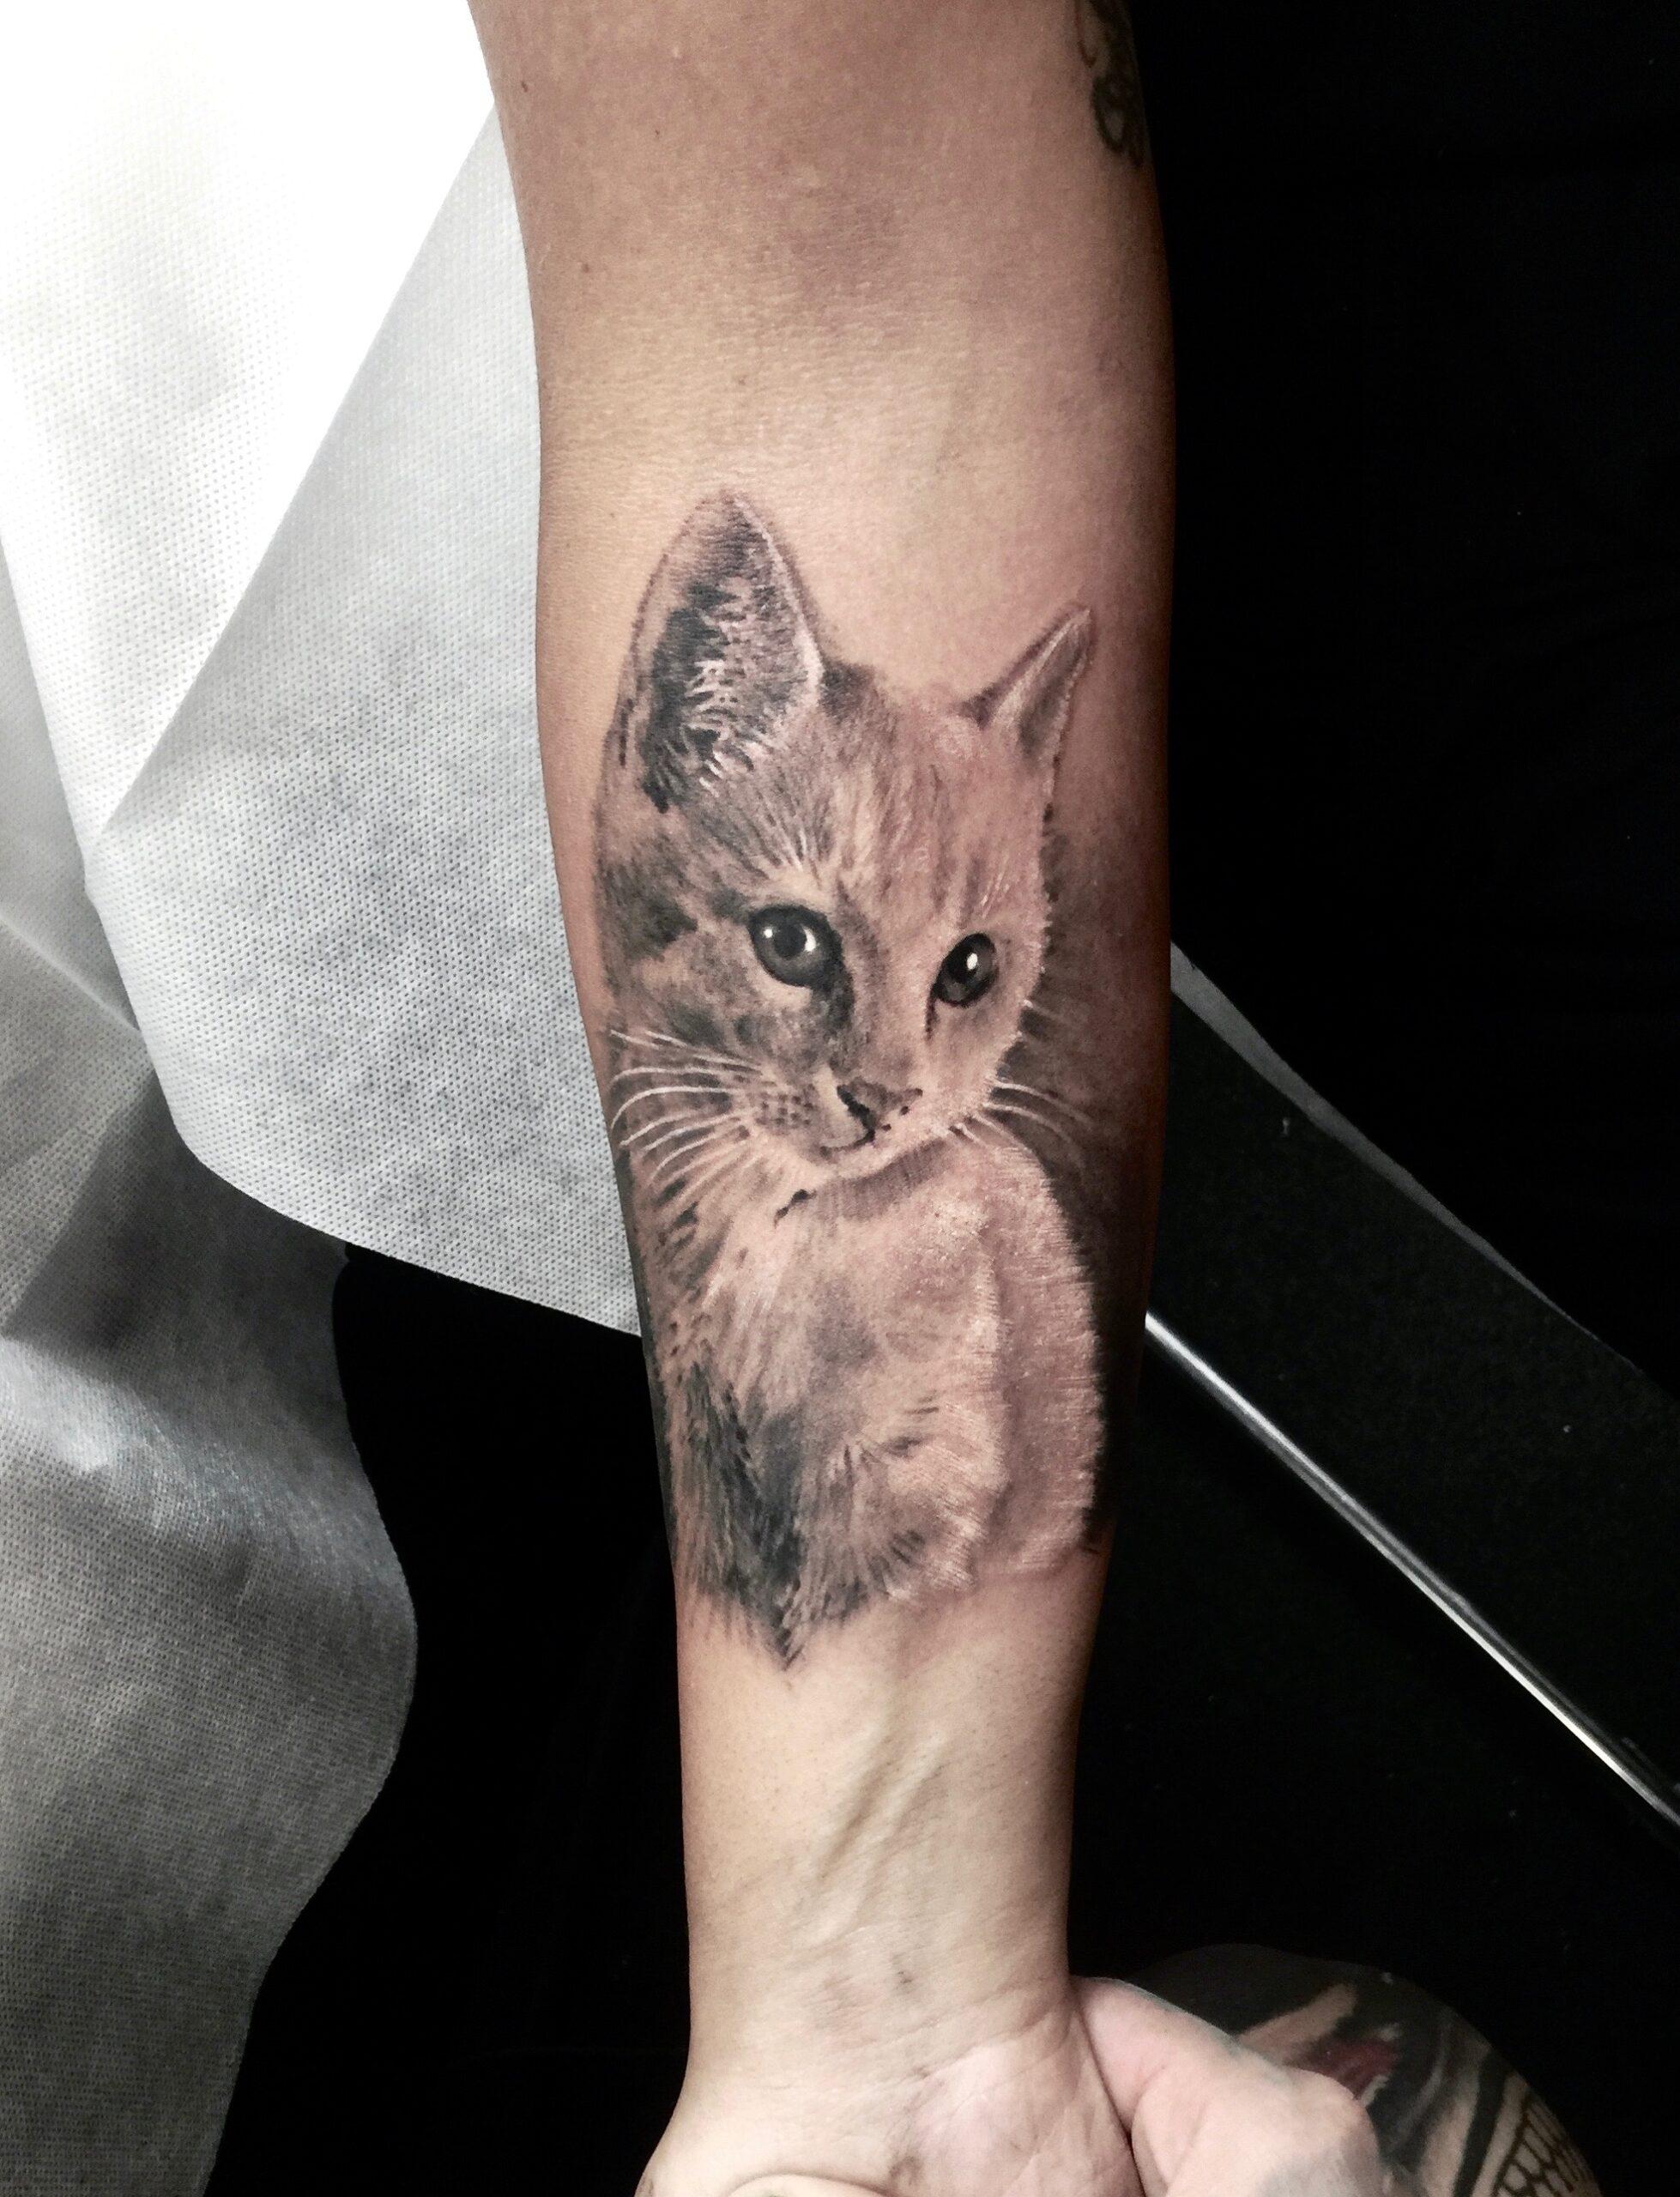 zhuo dan ting tattoo work cat tattoo卓丹婷纹身作品 猫咪纹身 1